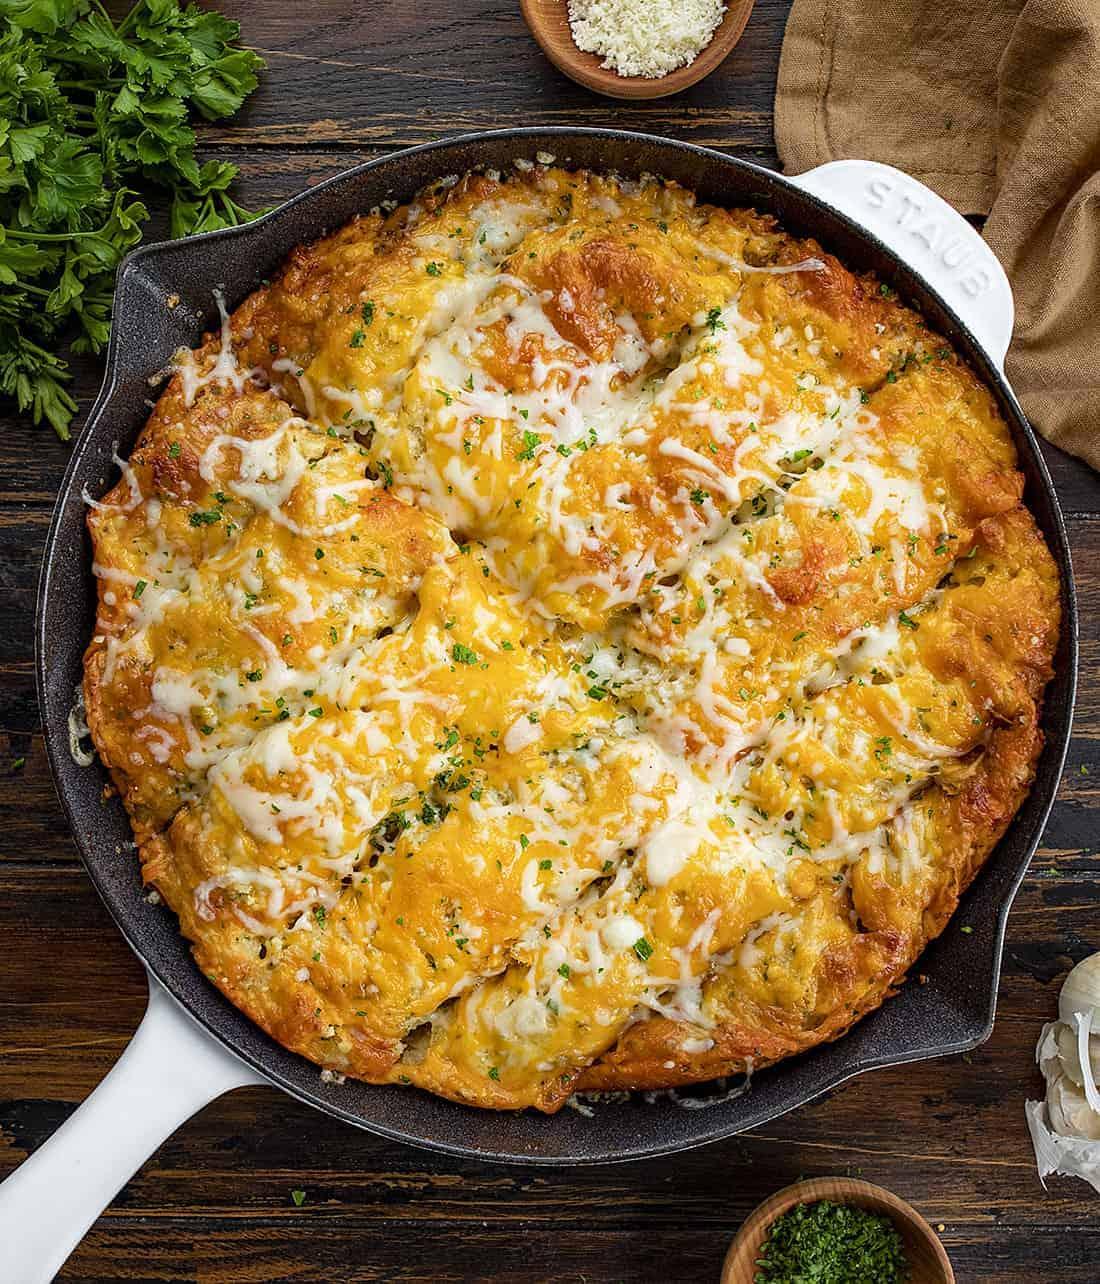 Overhead View of Focaccia Cheesy Garlic Bread in Skillet